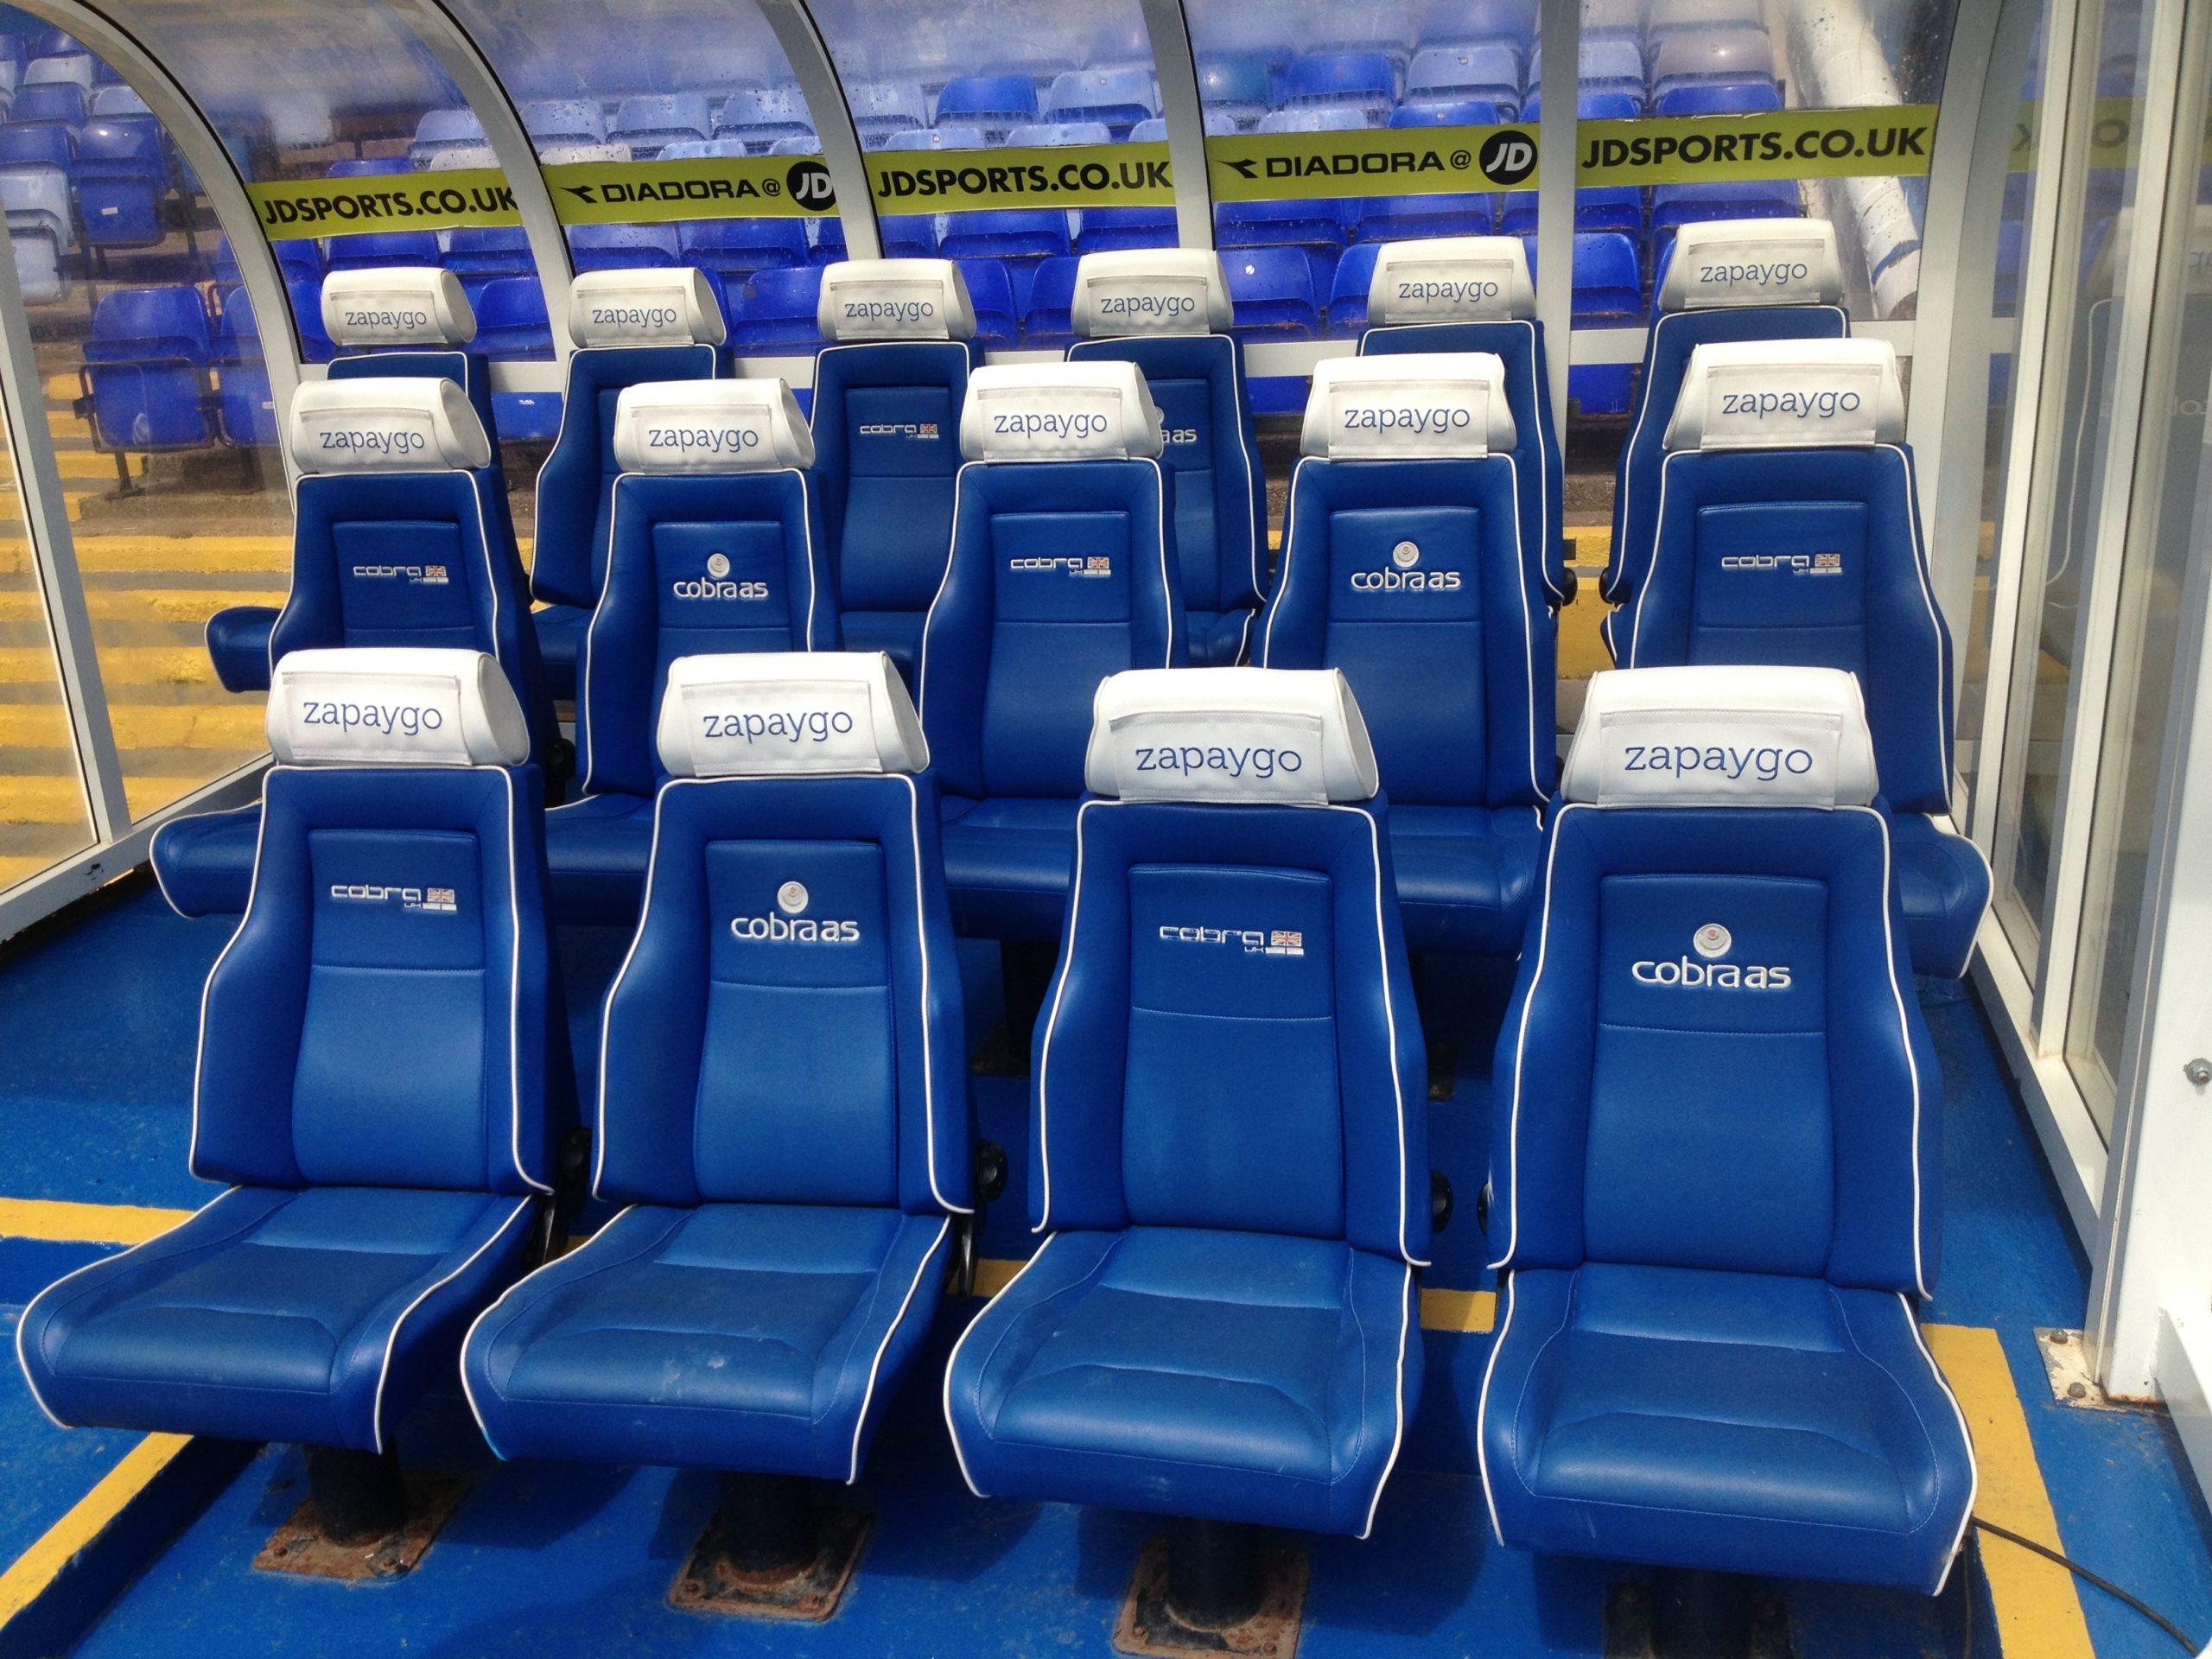 STADIUM SEAT UPHOLSTERY